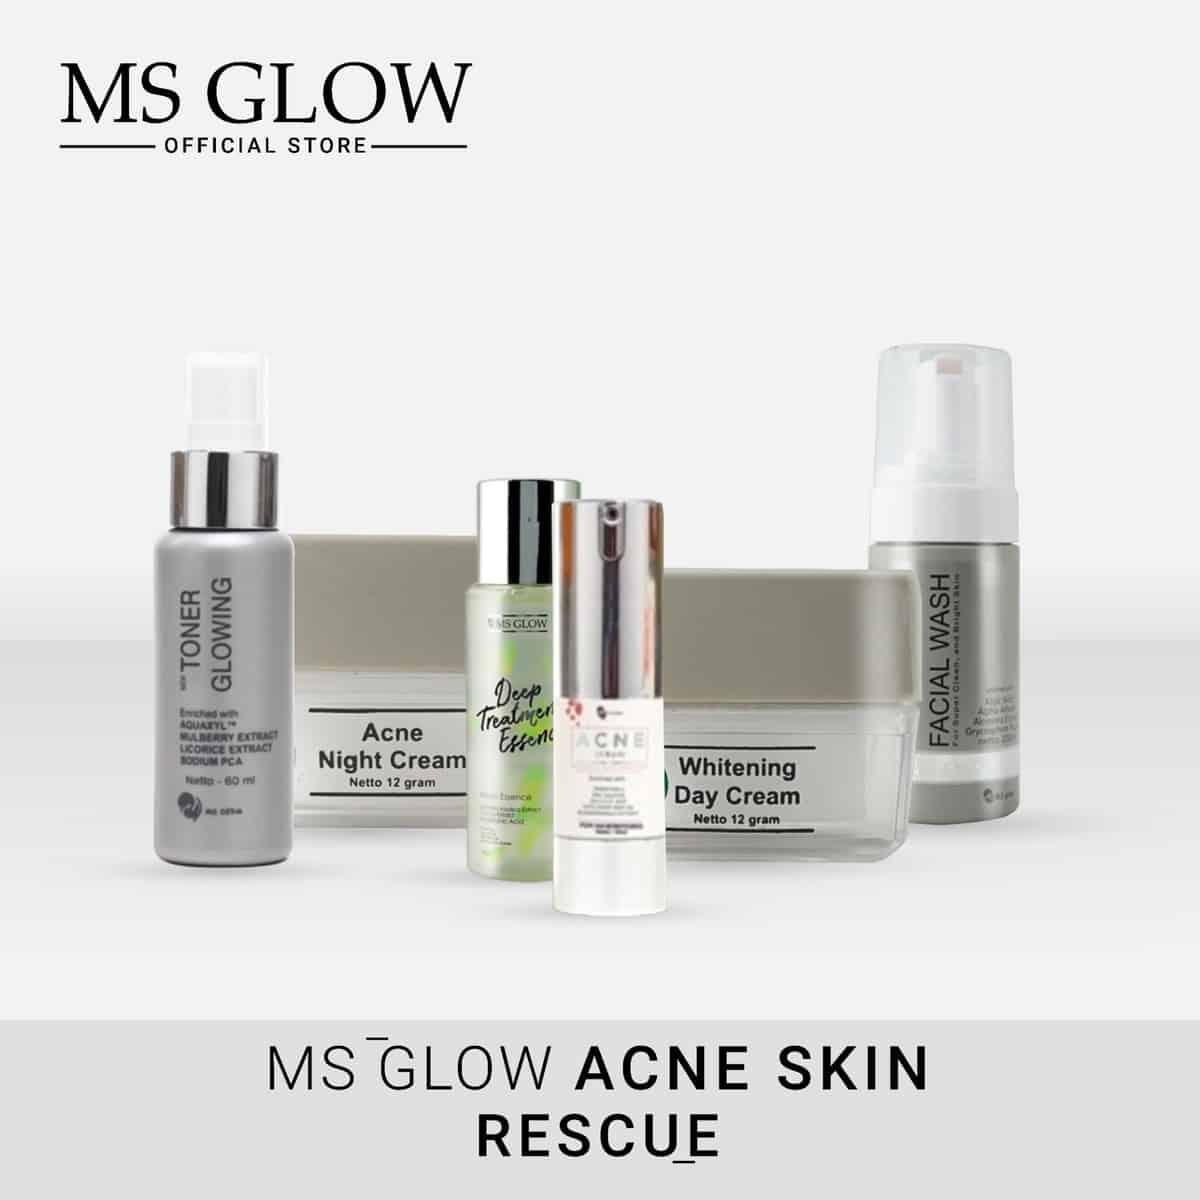 Acne-Skin-Rescue